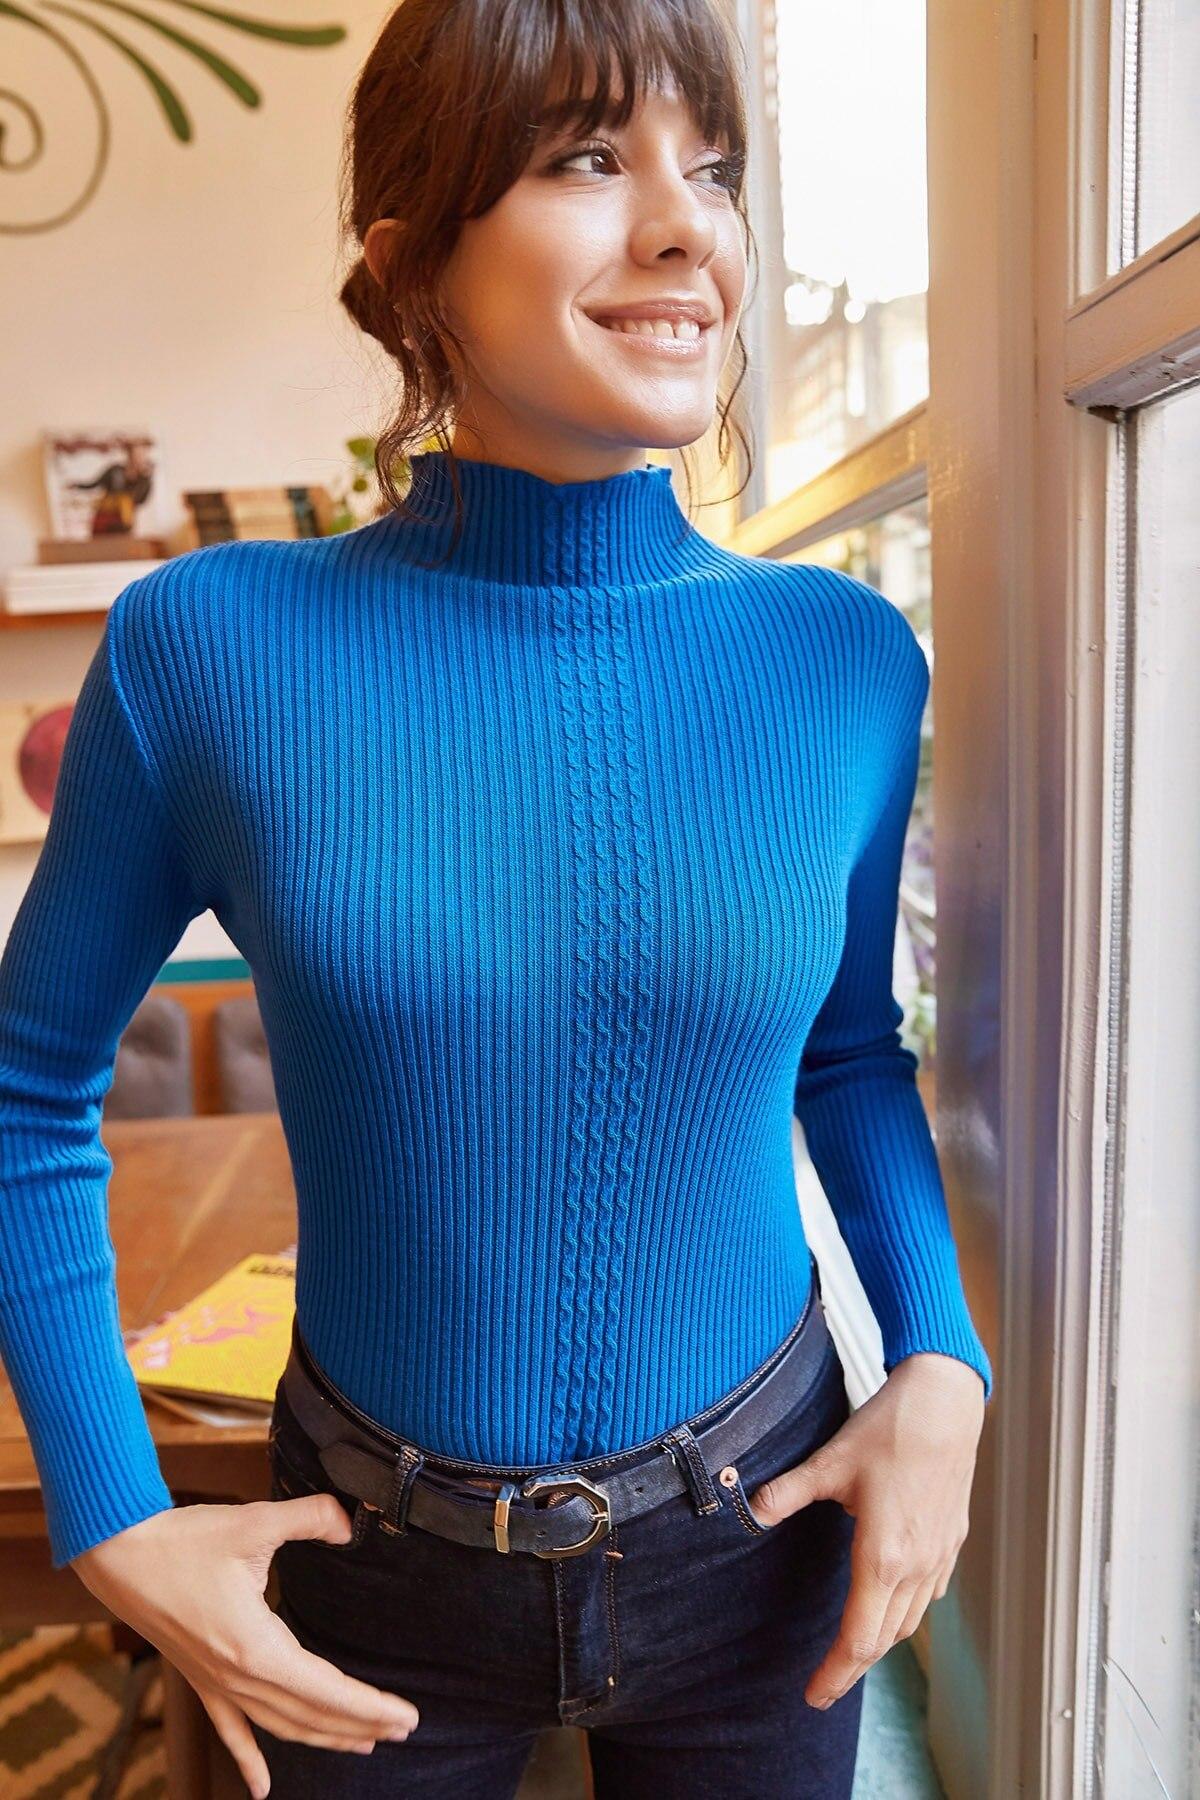 Ola mujeres Saks Collar azul solo pelo trenzado tejido suéter KZK-19000092